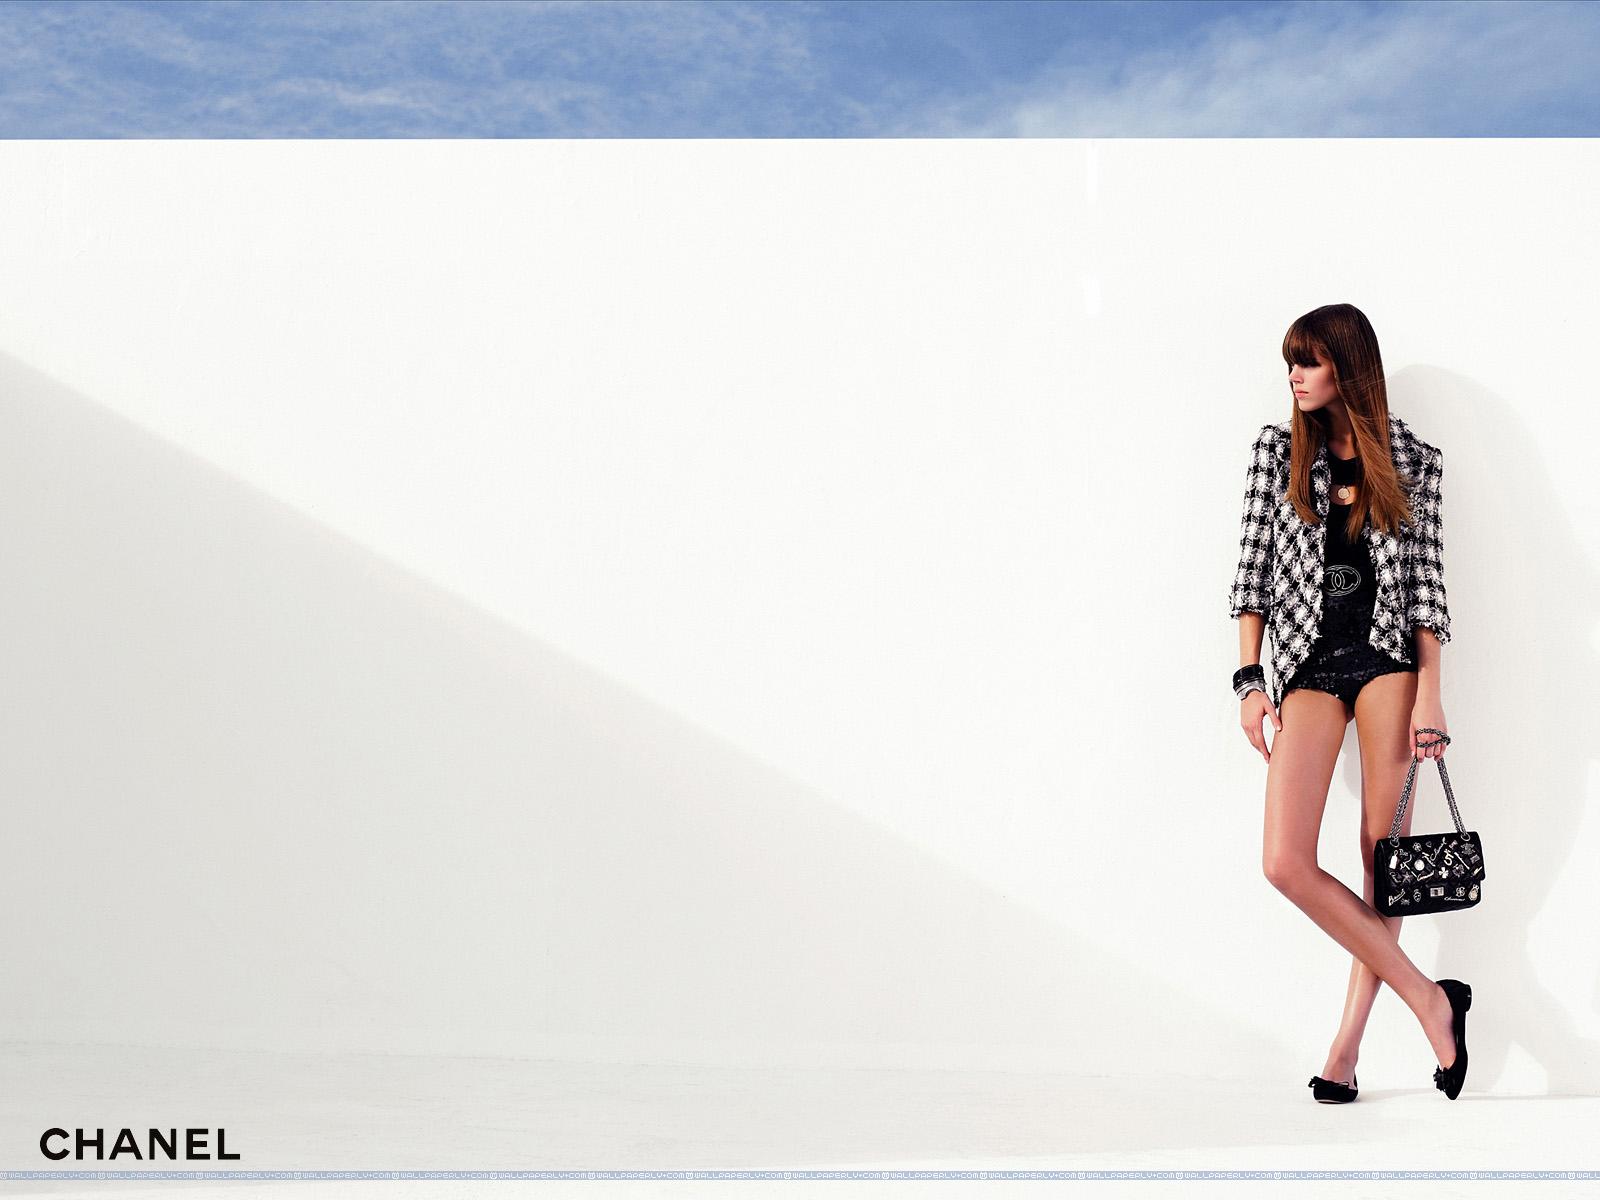 Group of Chanel Spring   Summer Fashion Wallpaper   Desktop Wallpaper 1600x1200